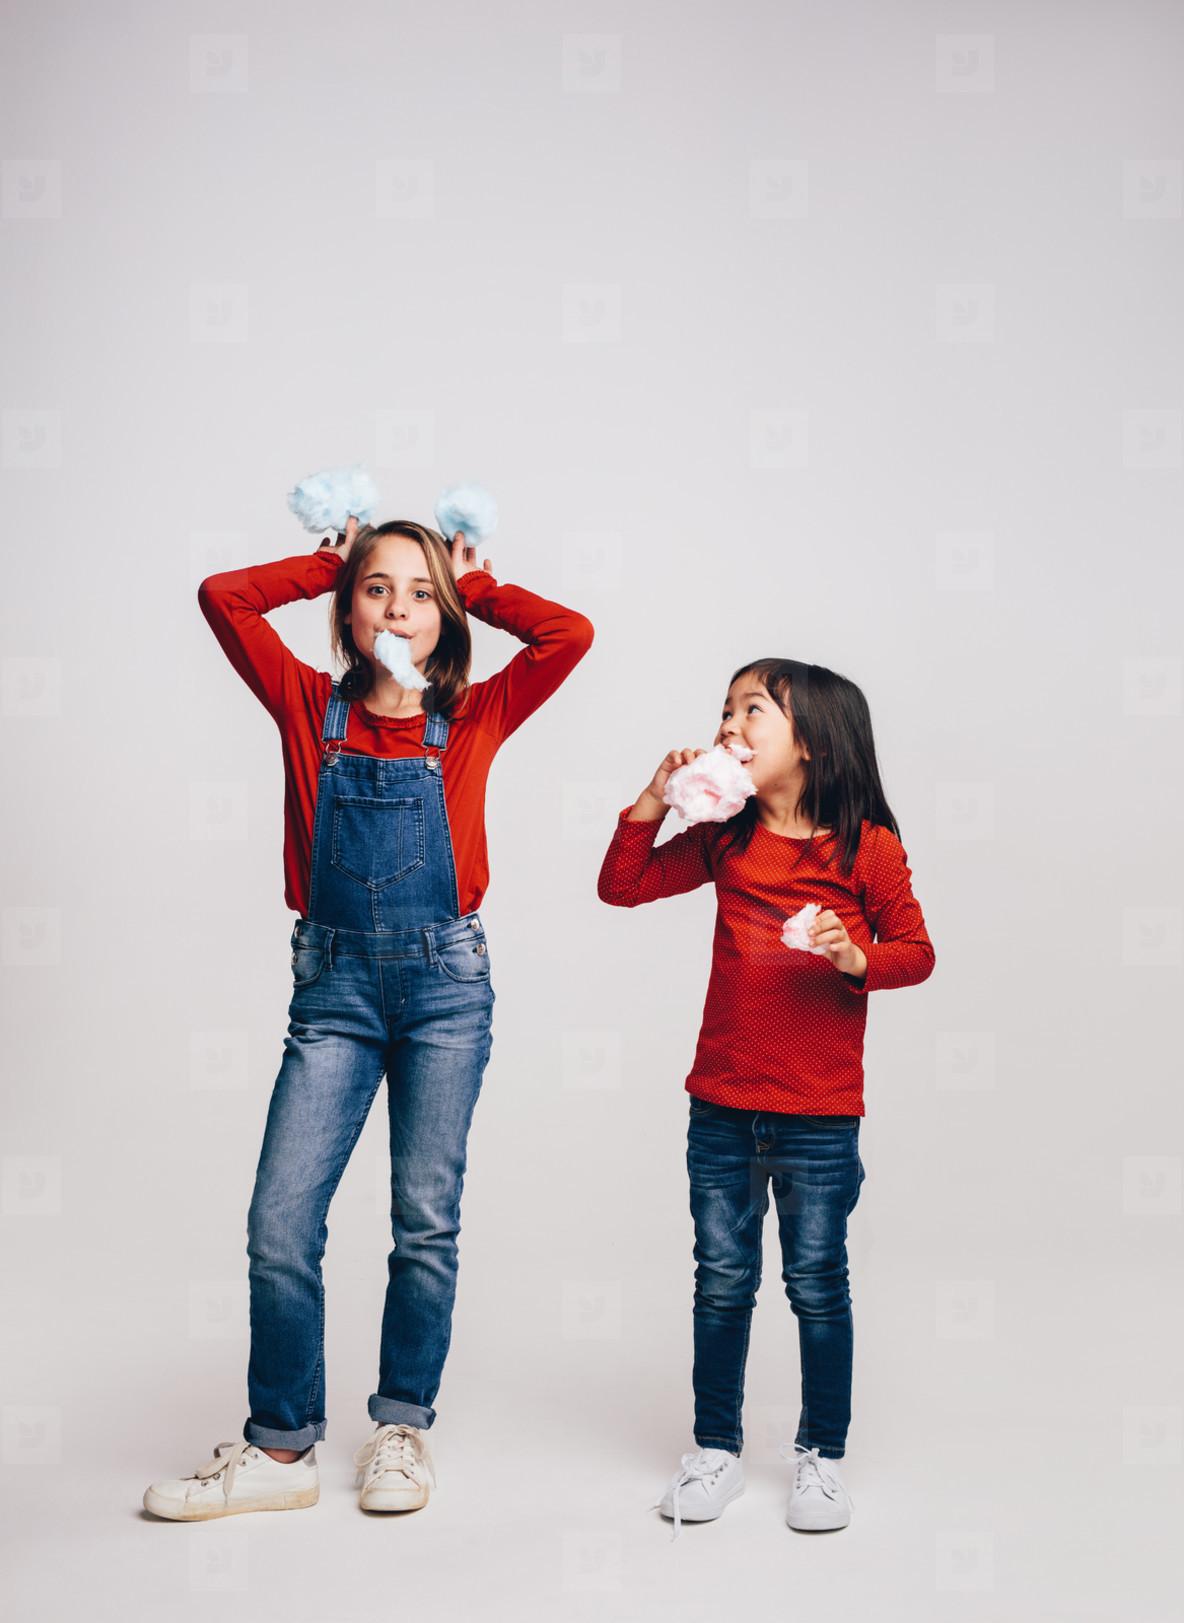 Girls having fun eating candy floss